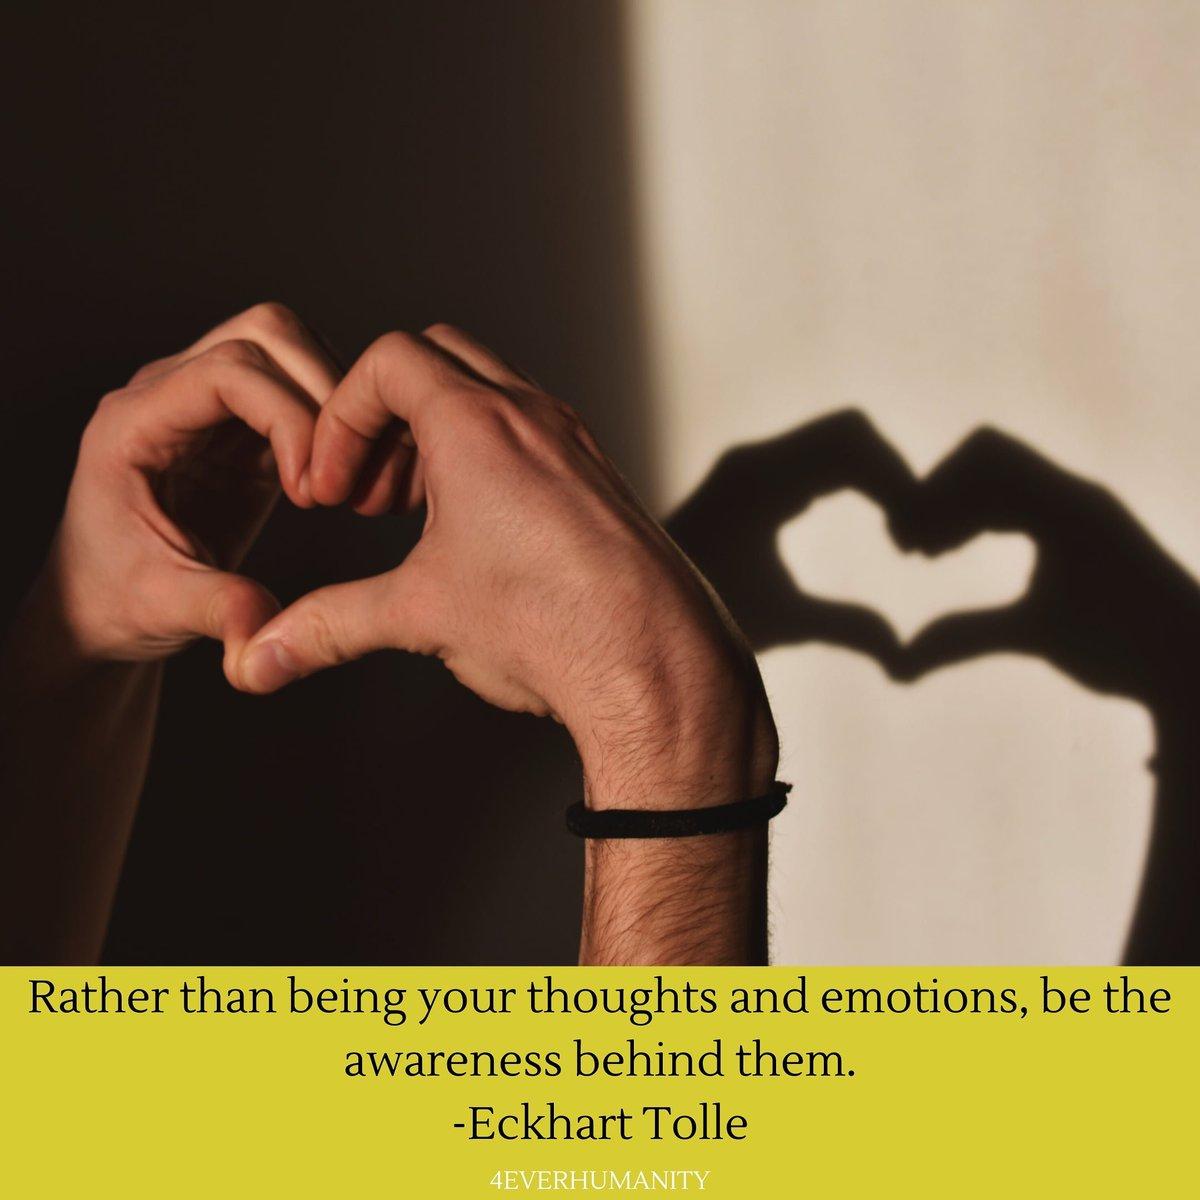 #meditation #yoga #love #mindfulness #spirituality #healing #peace #spiritual #selflove #selfcare #nature #wellness #motivation #inspiration #namaste #life #meditate #health #zen #spiritualawakening #gratitude #energy #fitness #art #consciousness #positivevibes #reiki #yogalife pic.twitter.com/pZ2sJwCz55